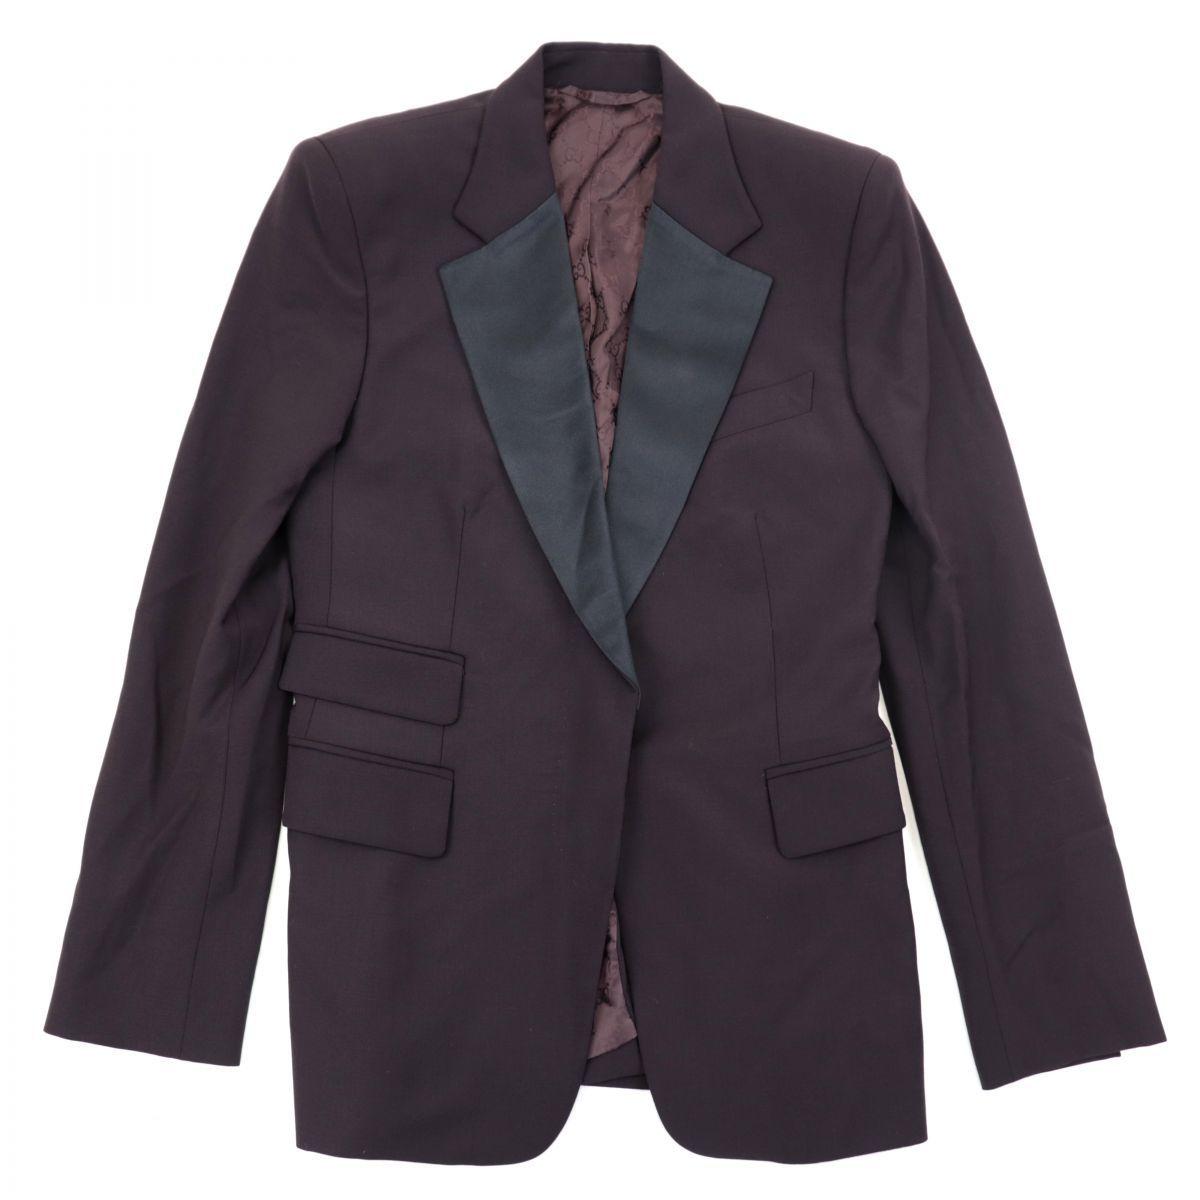 Gucci GG Pattern Lining 1B Single Tailored Jacket Women's Burgundy 38 Satin Lapel